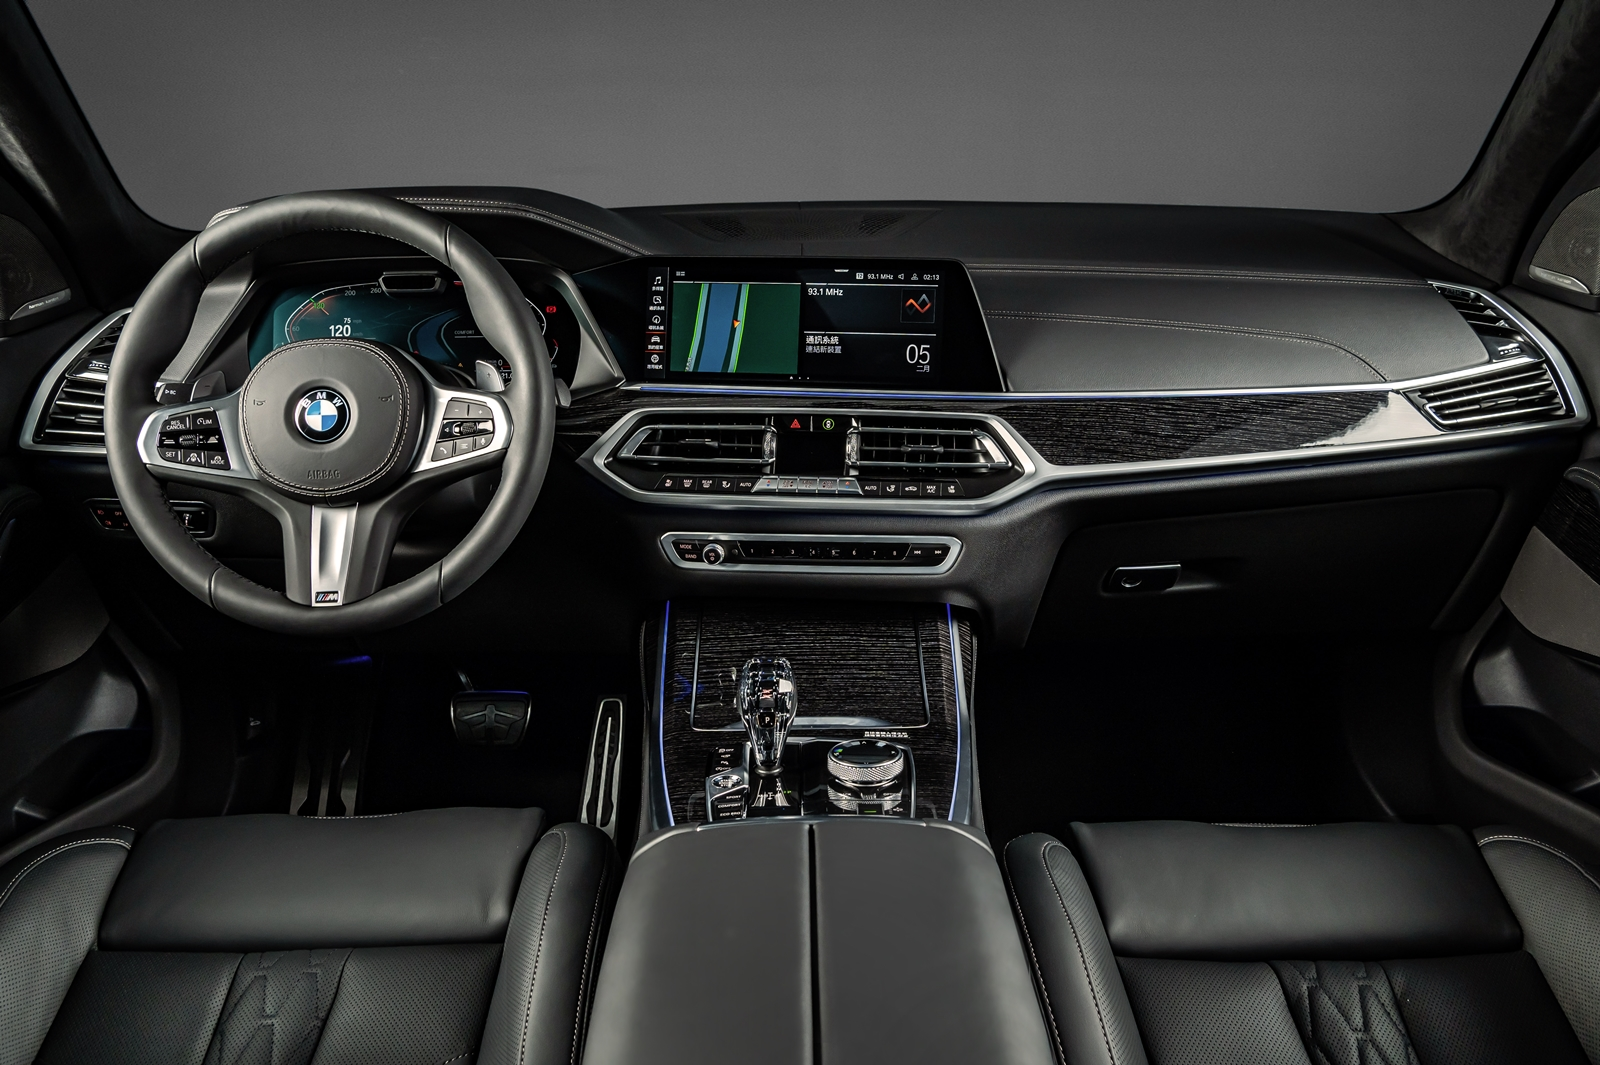 BMW X7 Dark Knight曜黑版配備全數位虛擬座艙、iDrive 7.0 操作介面、全新智慧語音助理2.0、iPhone手機數位鑰匙、無線智慧型手機整合系統、M 款多功能真皮方向盤與 Fineline 黑色高光澤木。